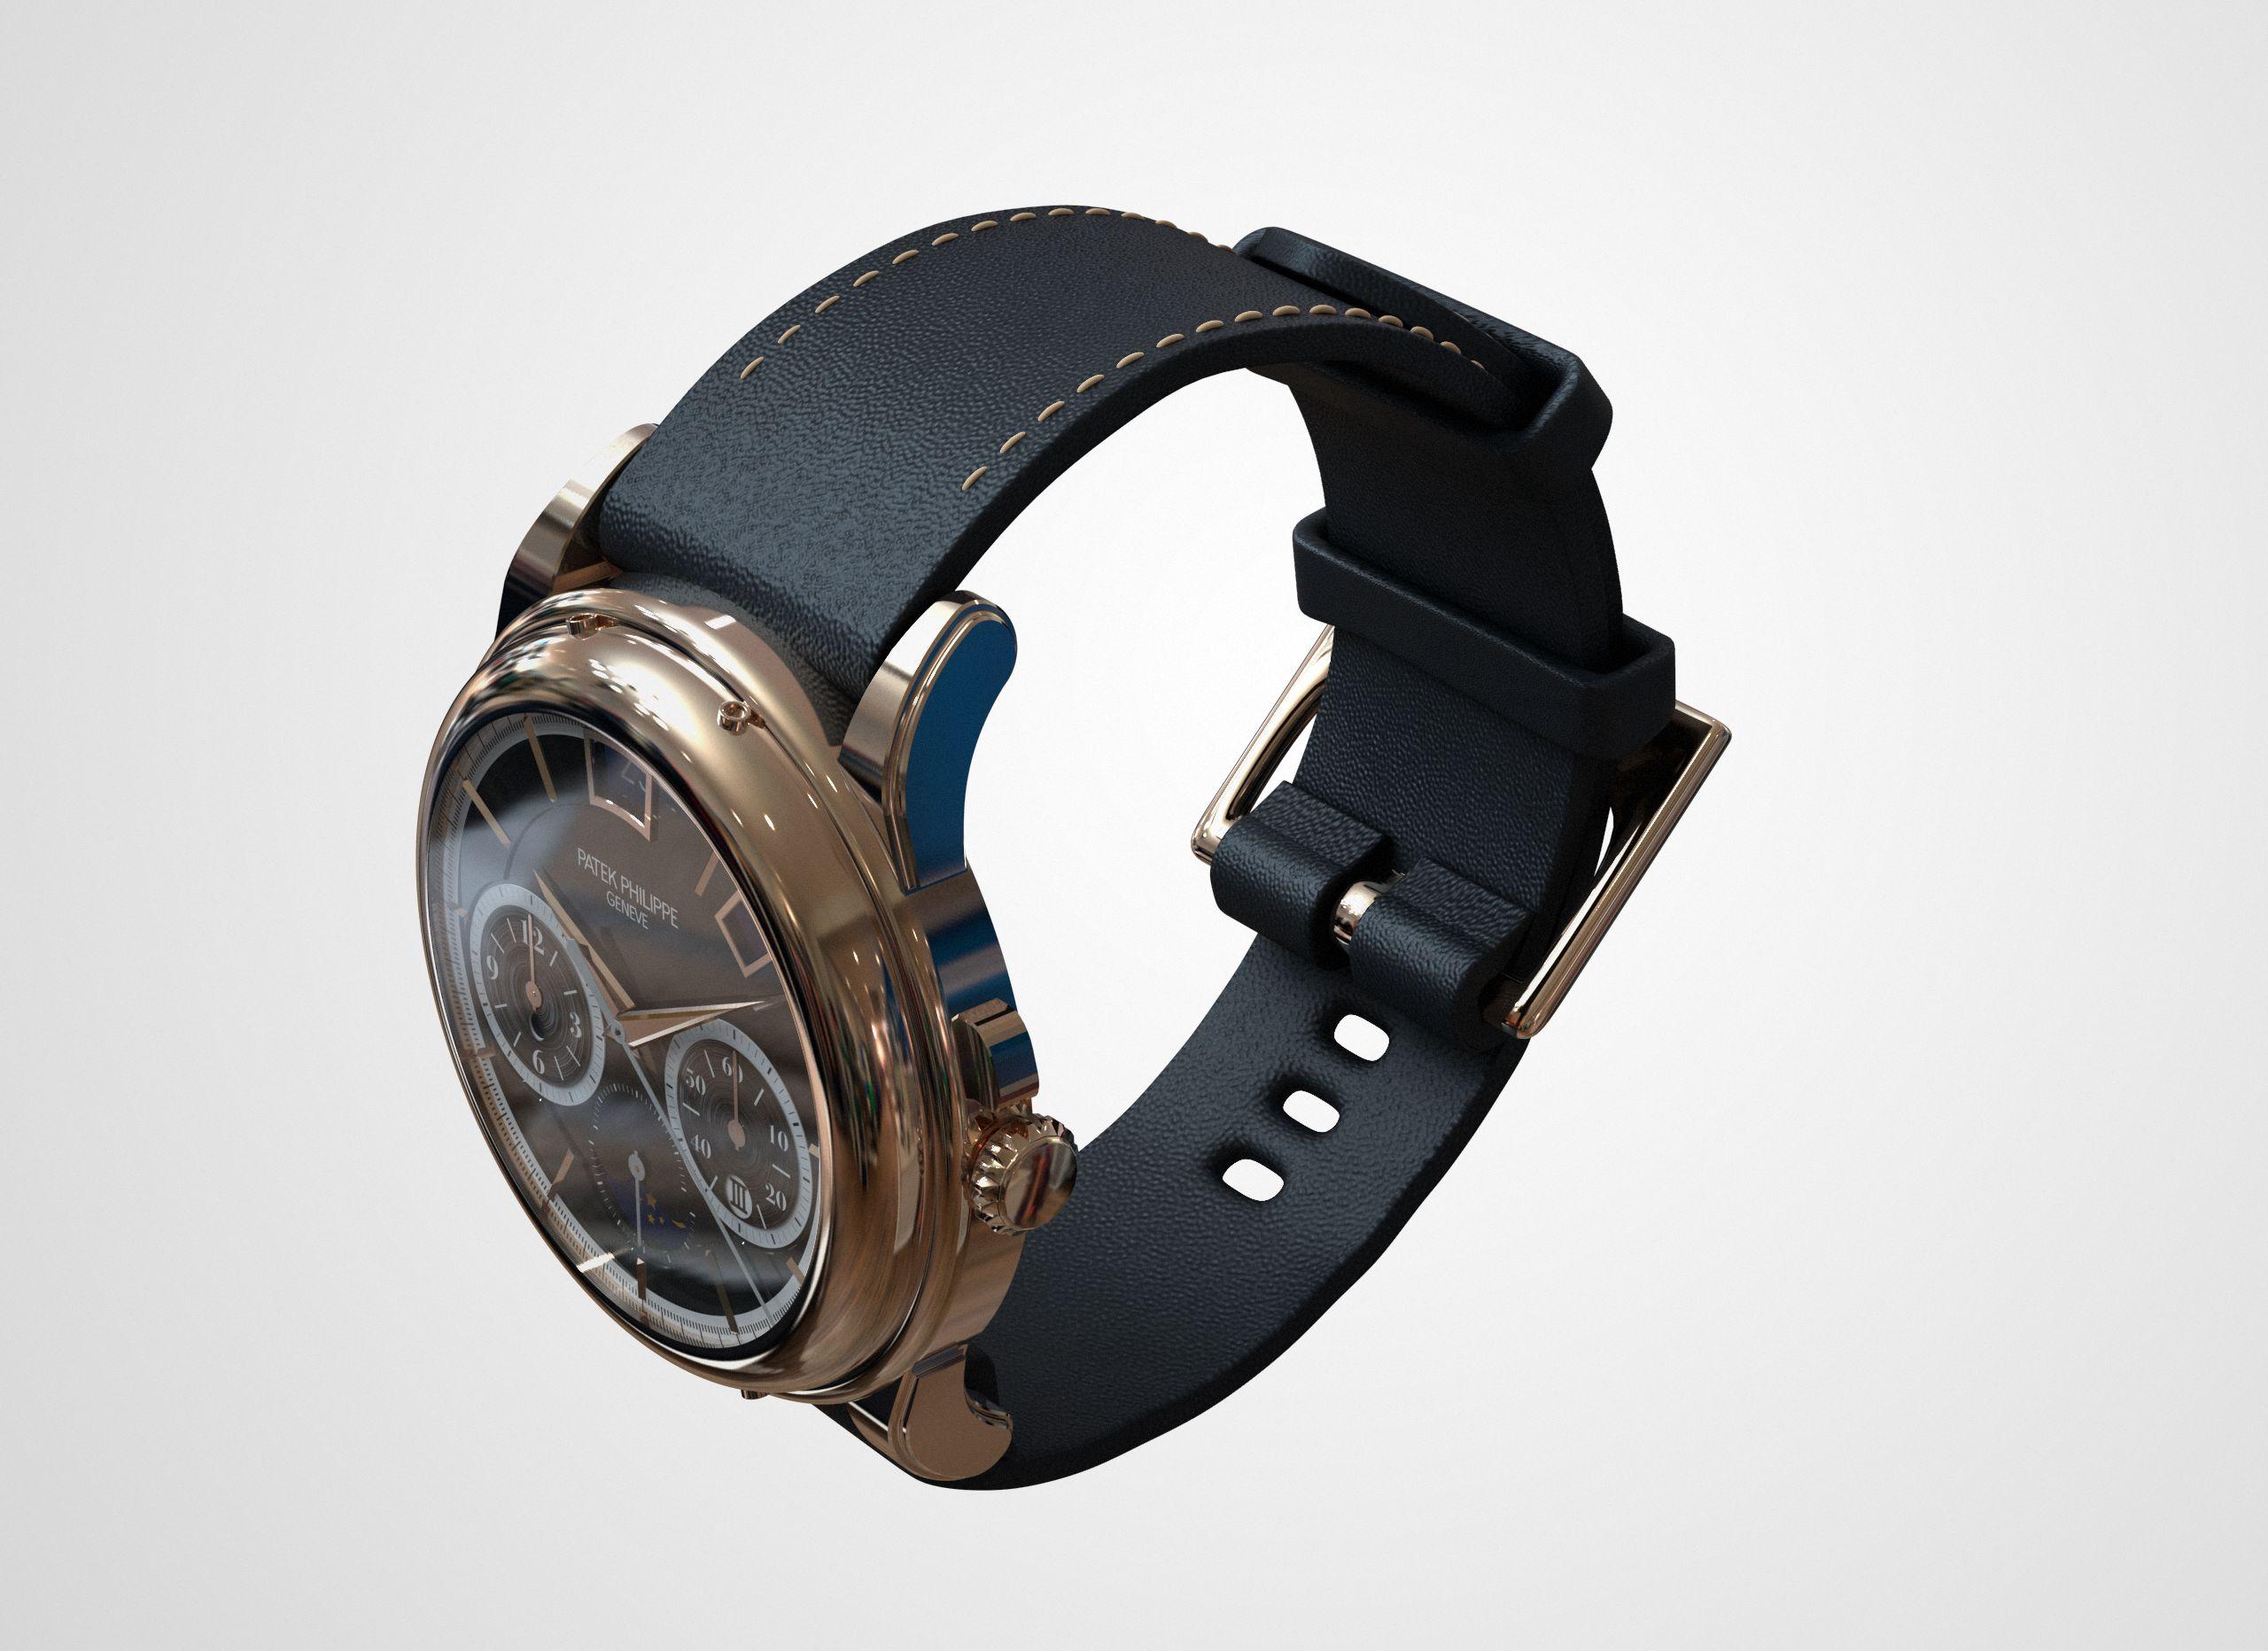 Watch-94-3500-3500